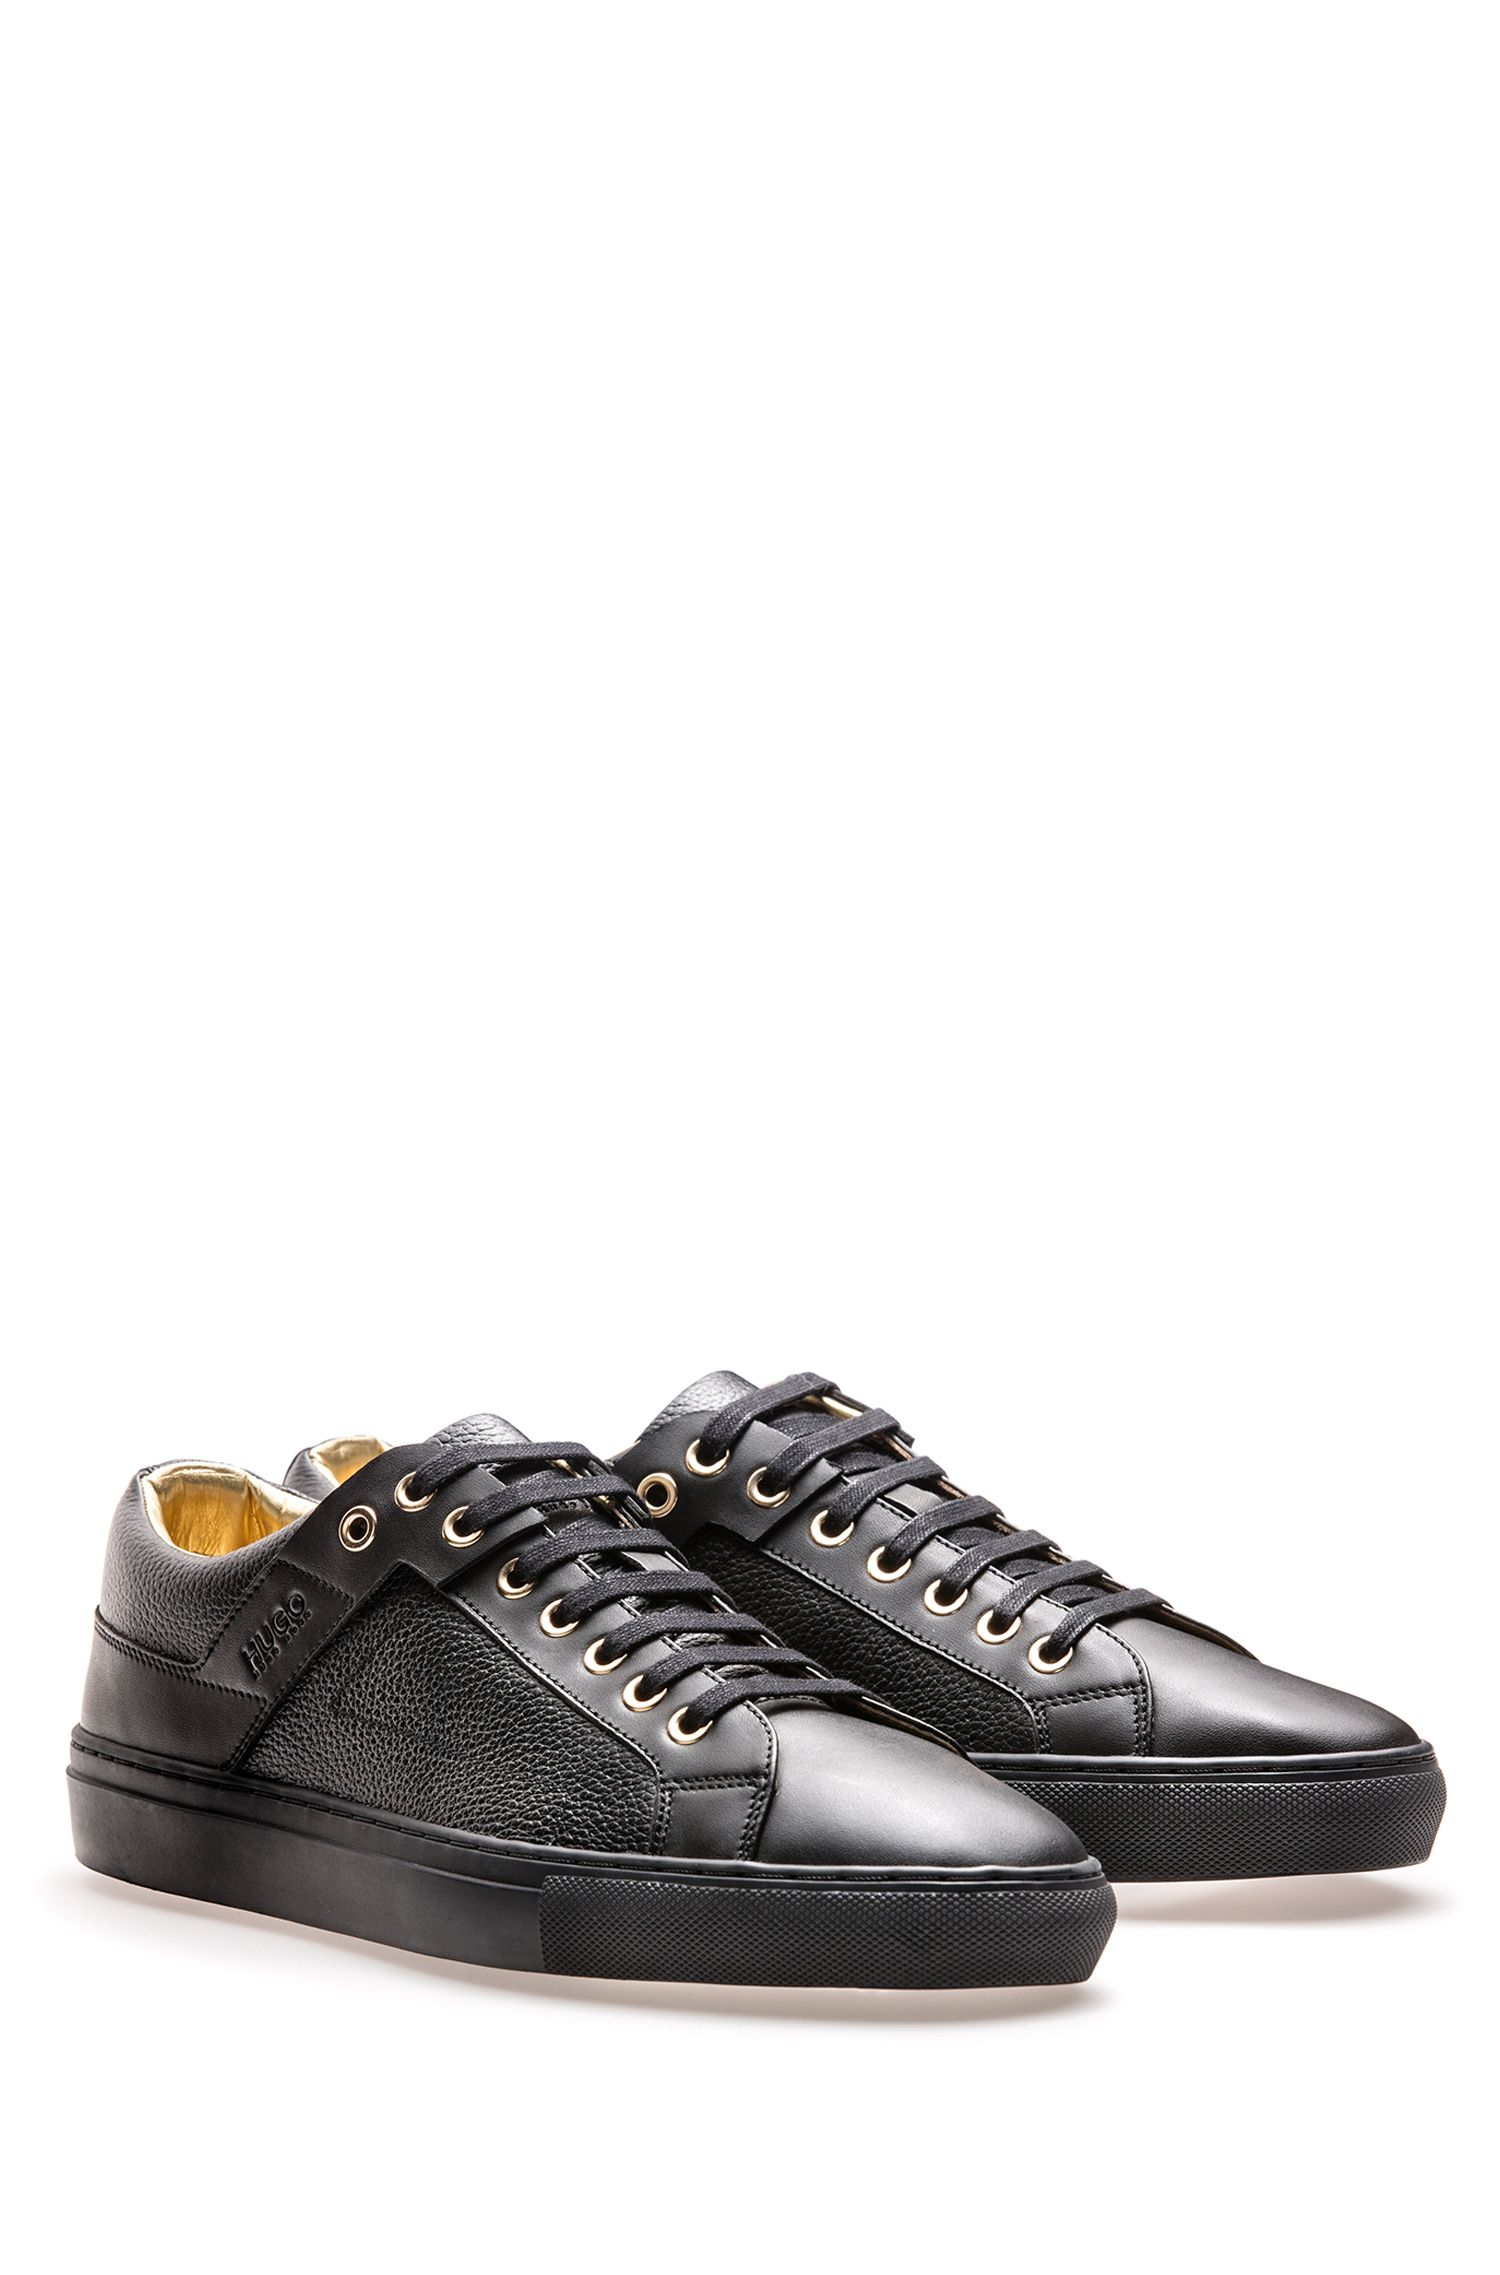 Sneakers aus gewalktem und glattem Leder